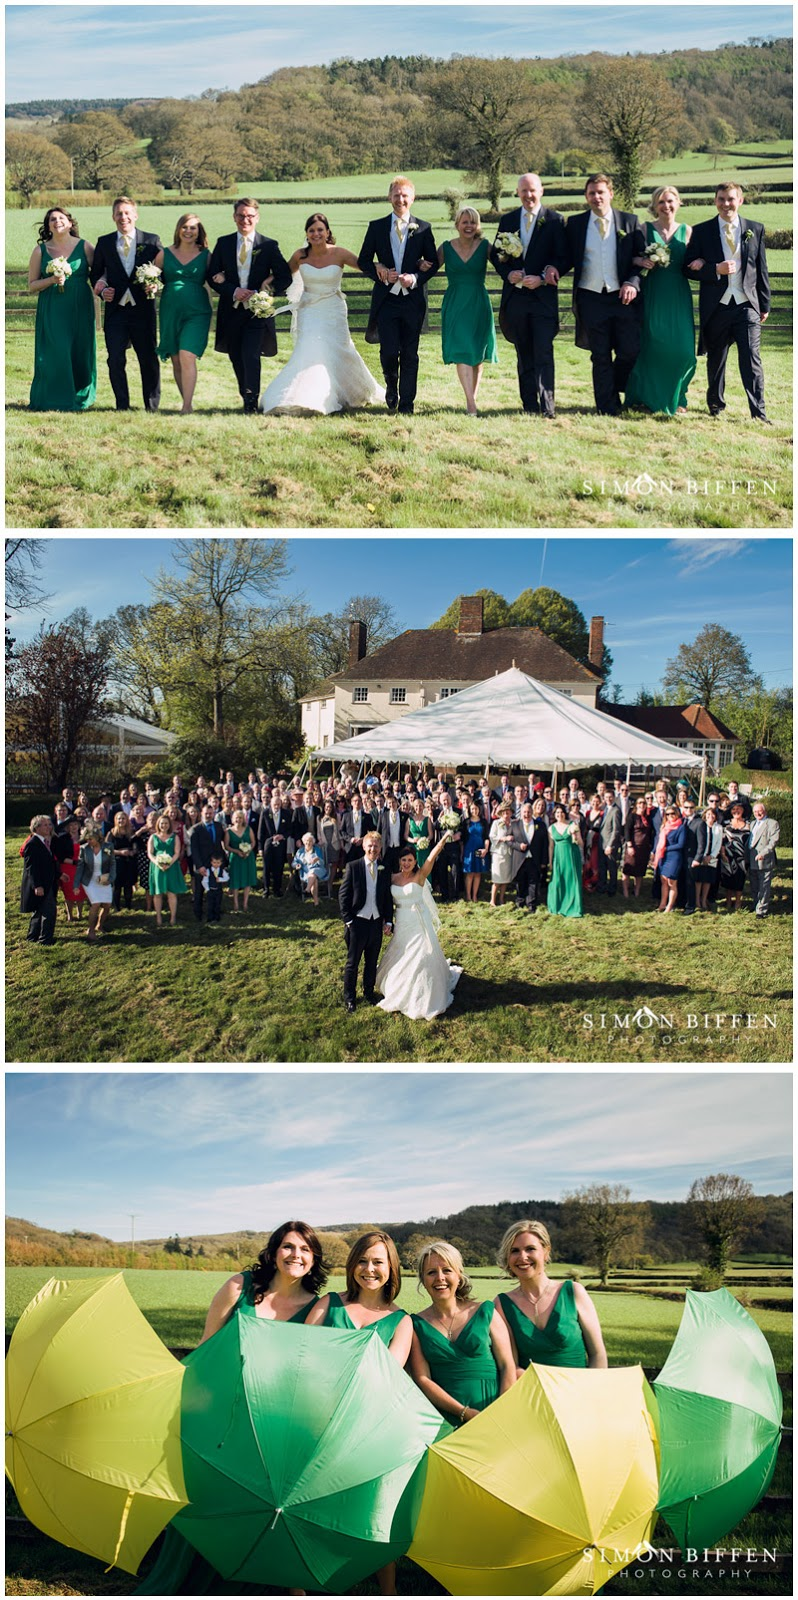 Group wedding photographs